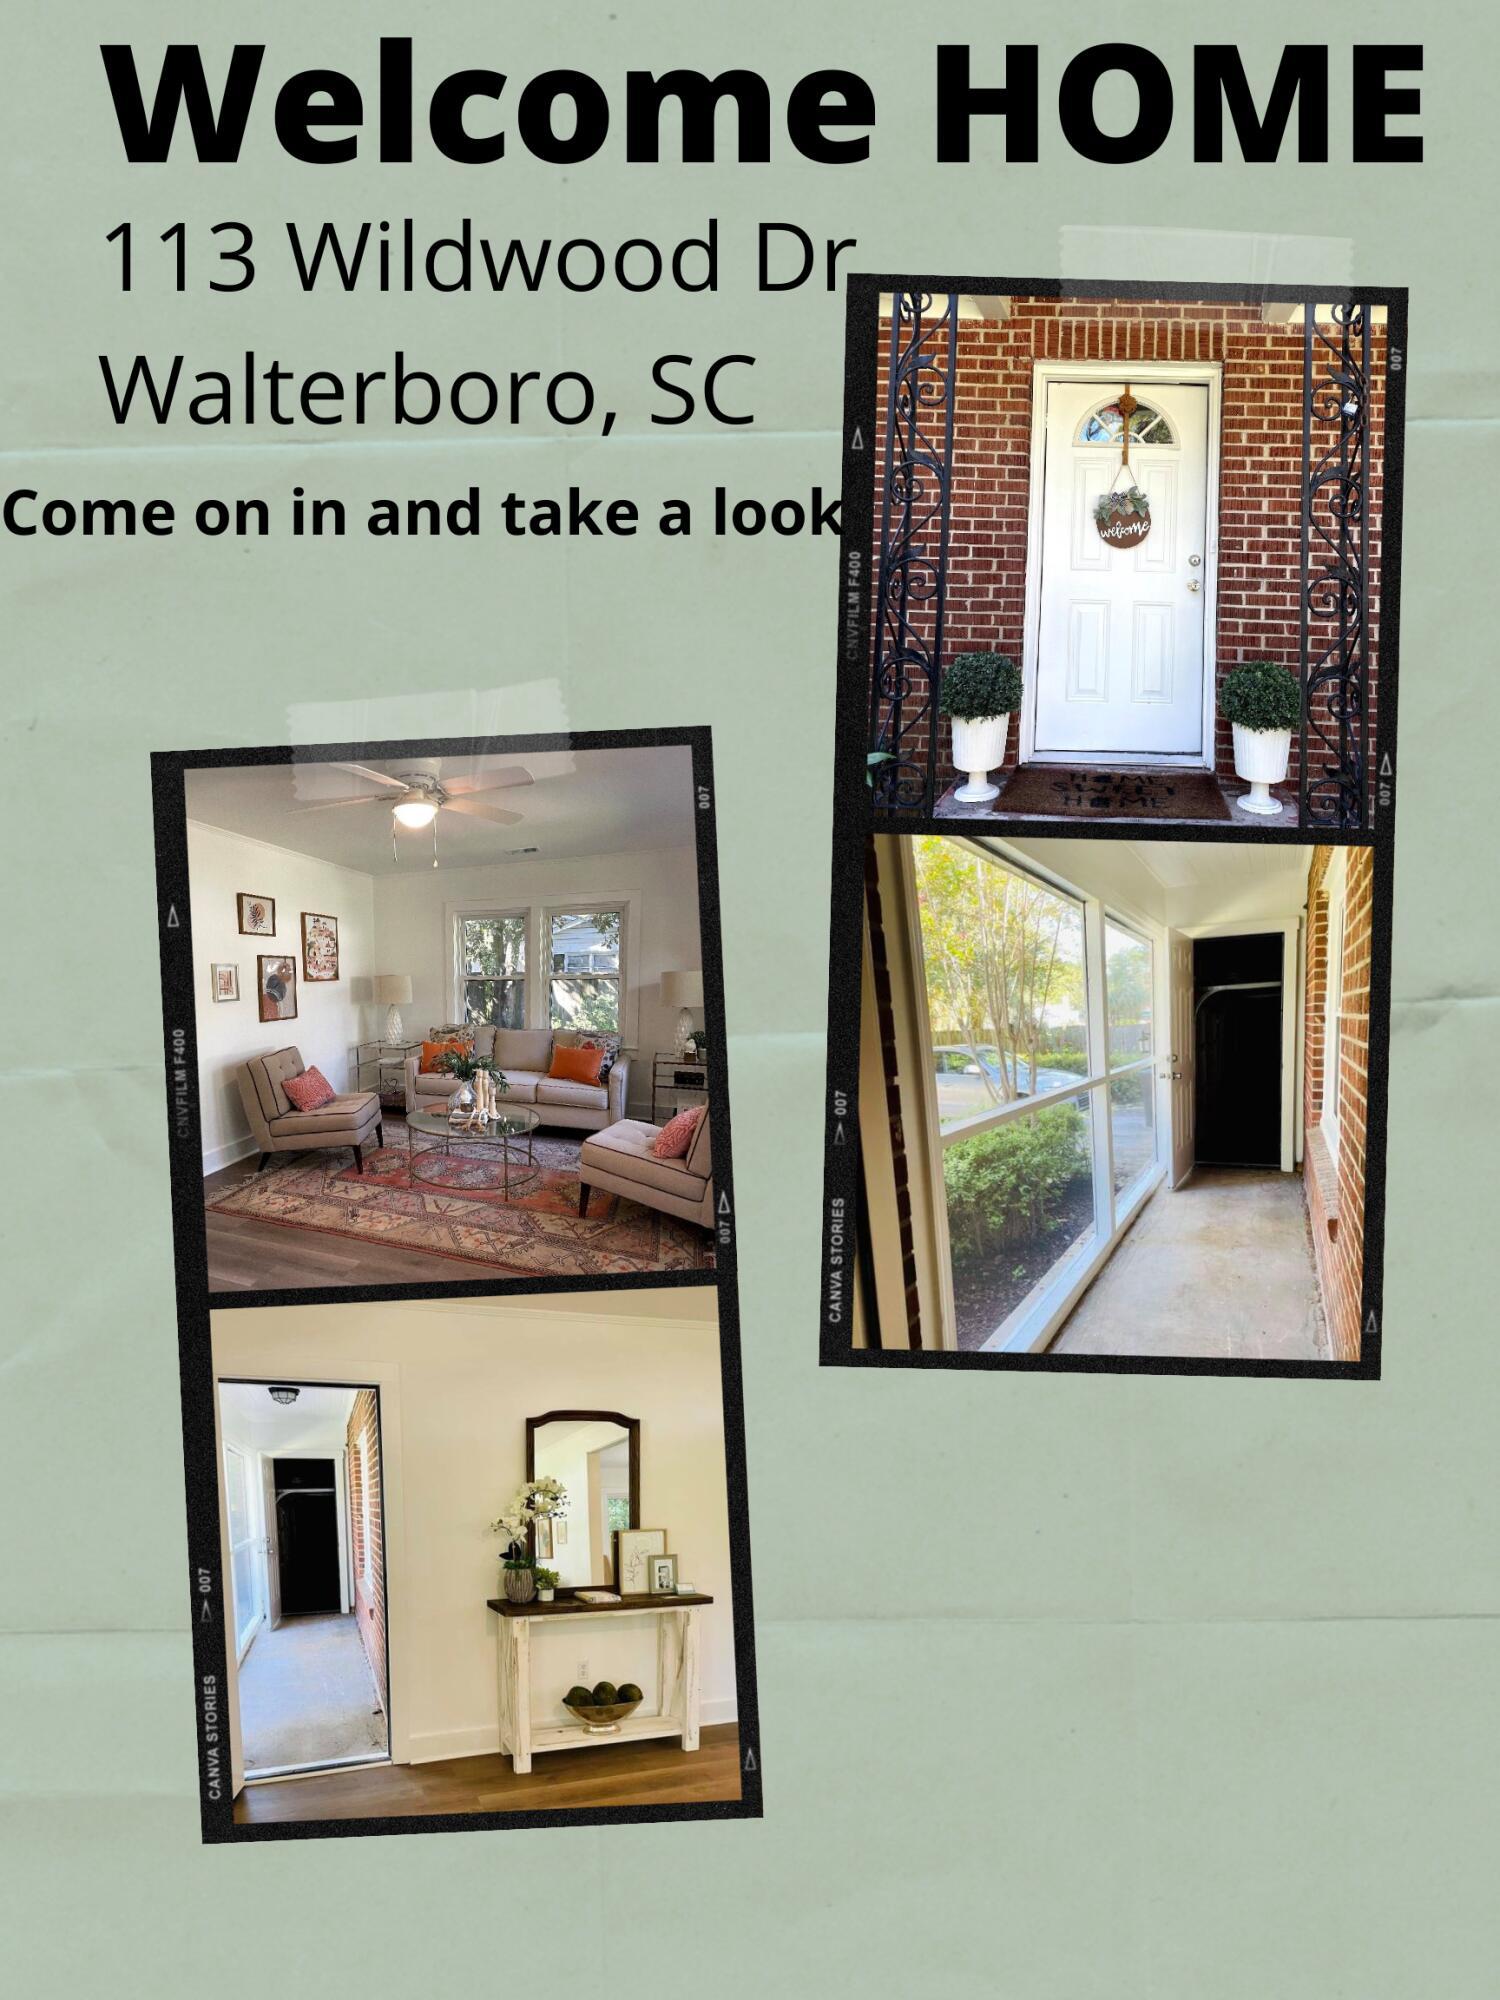 113 Wildwood Drive Walterboro, SC 29488